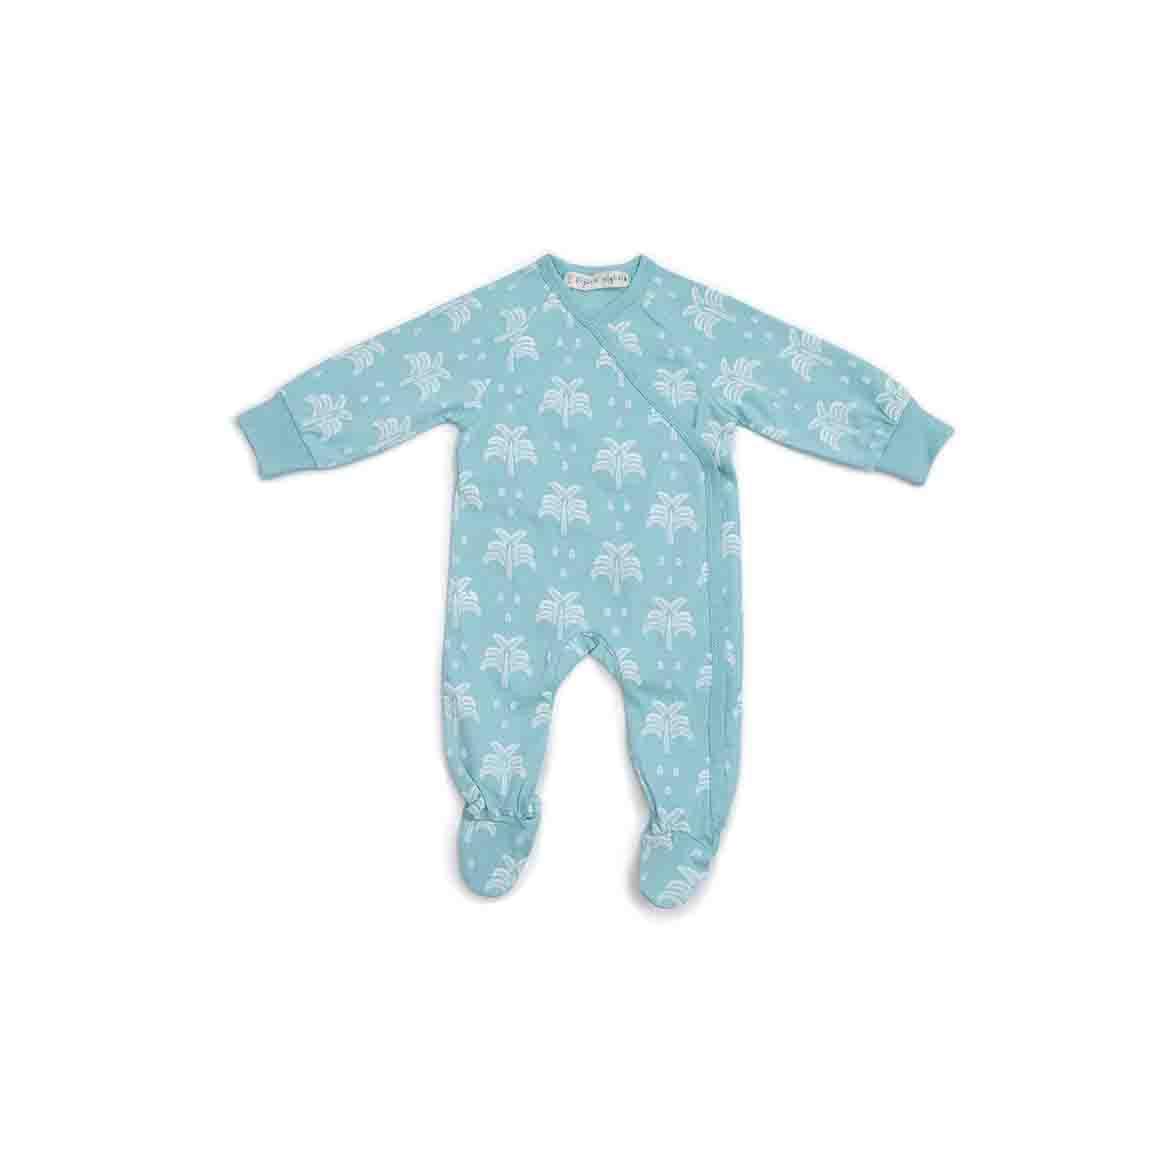 Baby Sleepsuit Kimono With Feet (Aquatic Blue - Palms & Pineapples Print)   Trada Marketplace